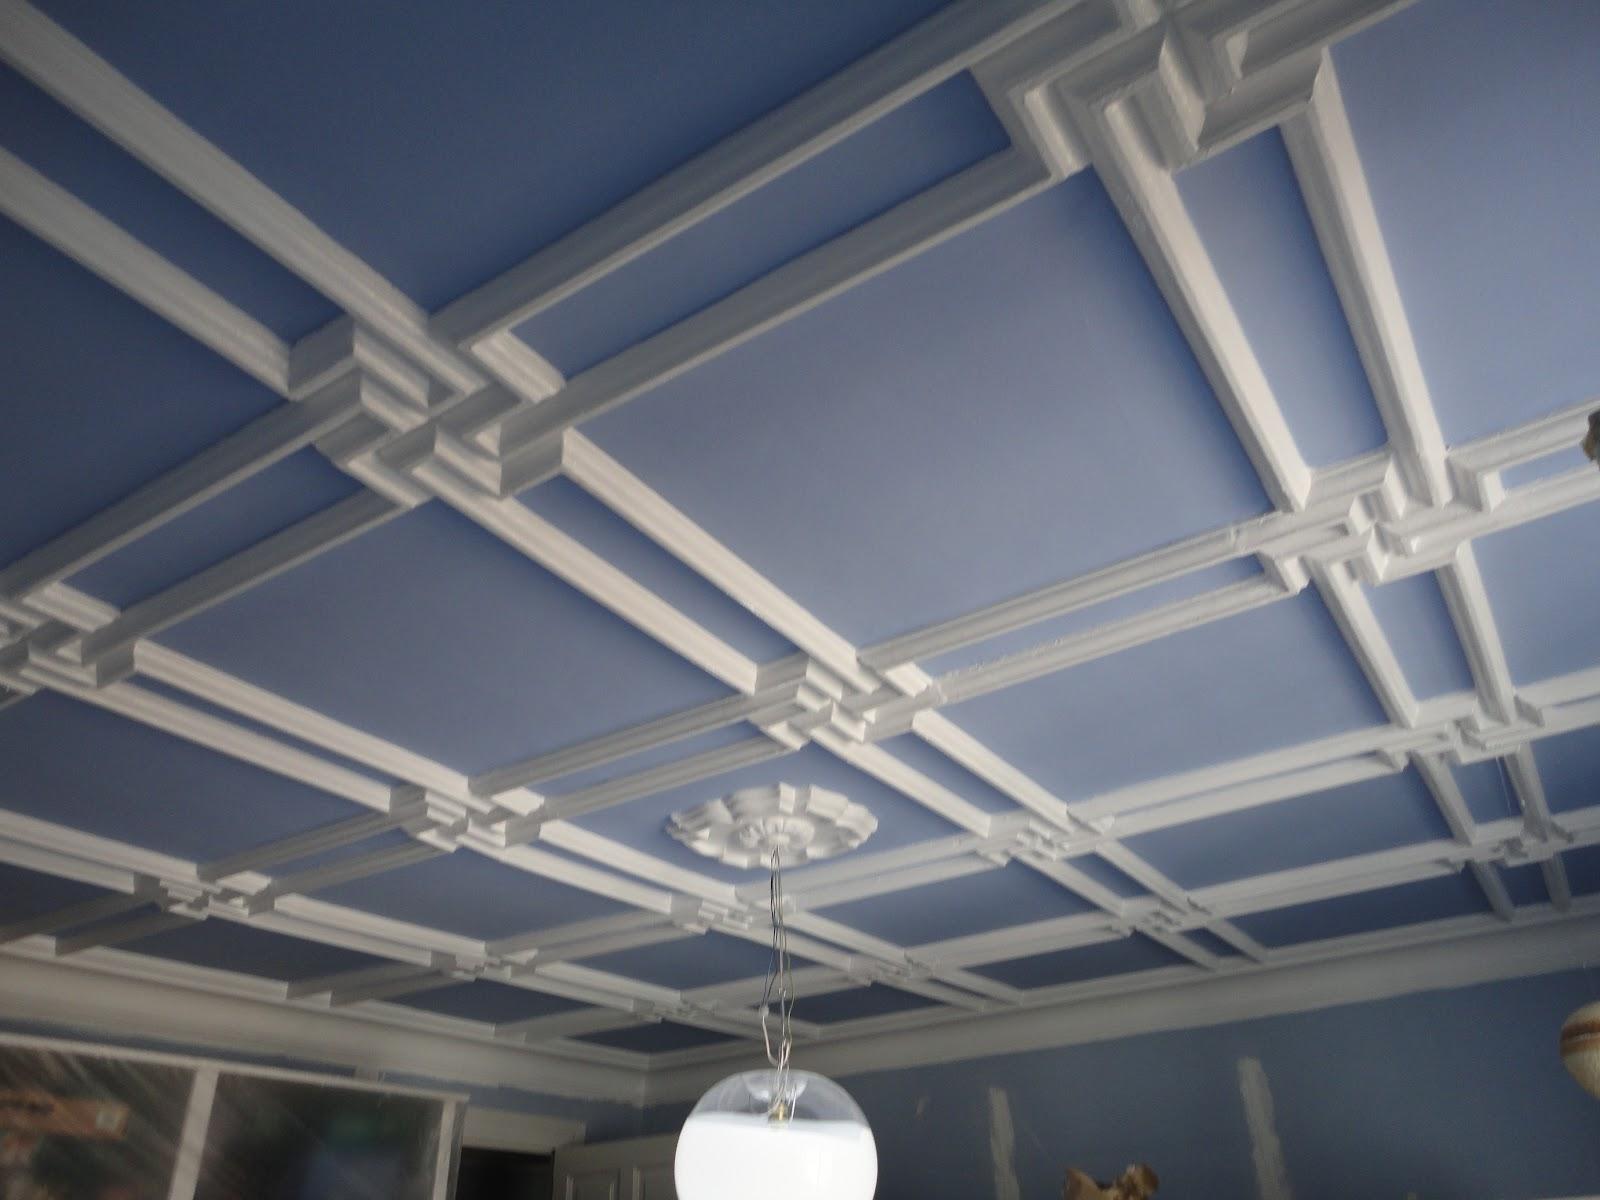 Pintura decorativa pintor david martinez - Escayola decorativa techo ...